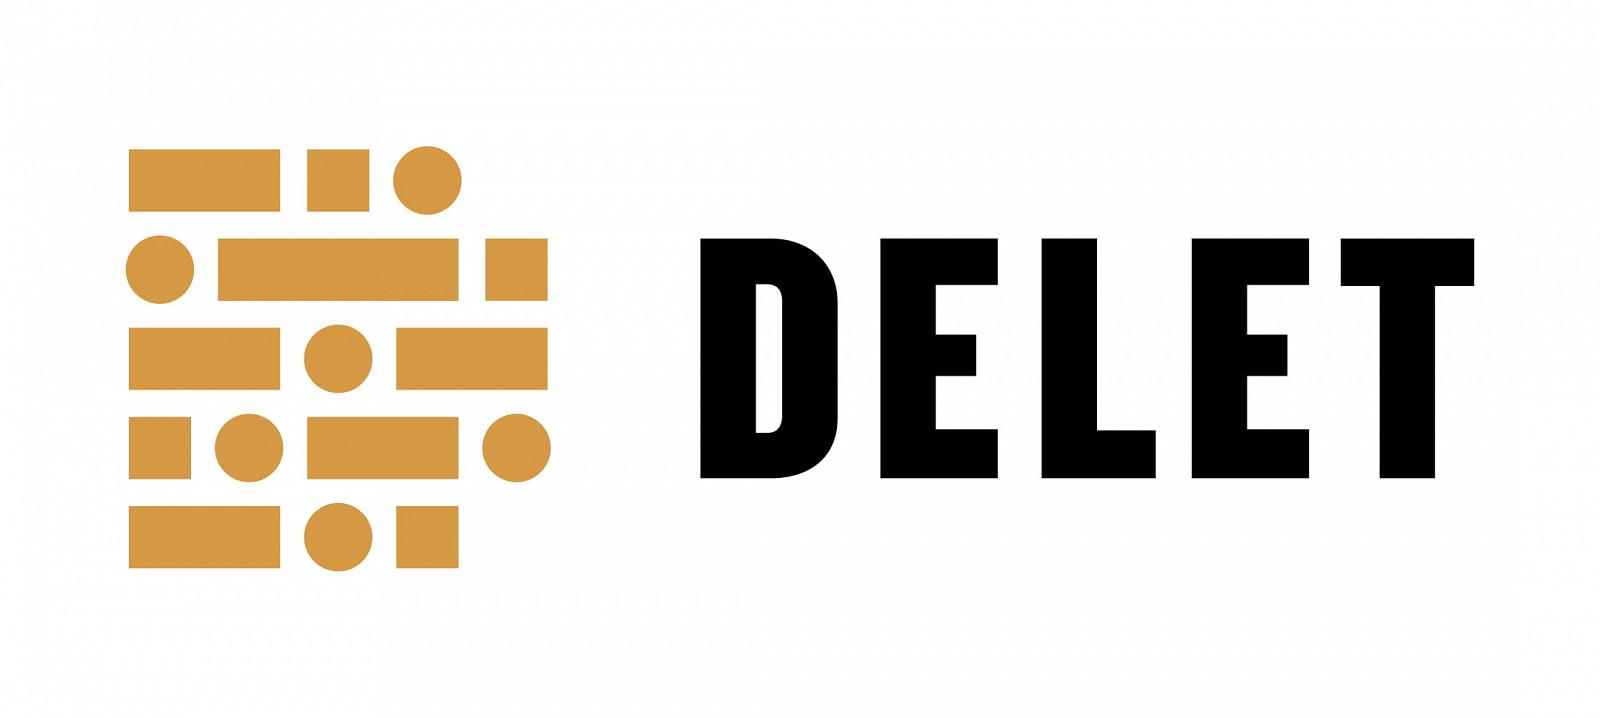 delet_logo-1.jpg [44.17 KB]